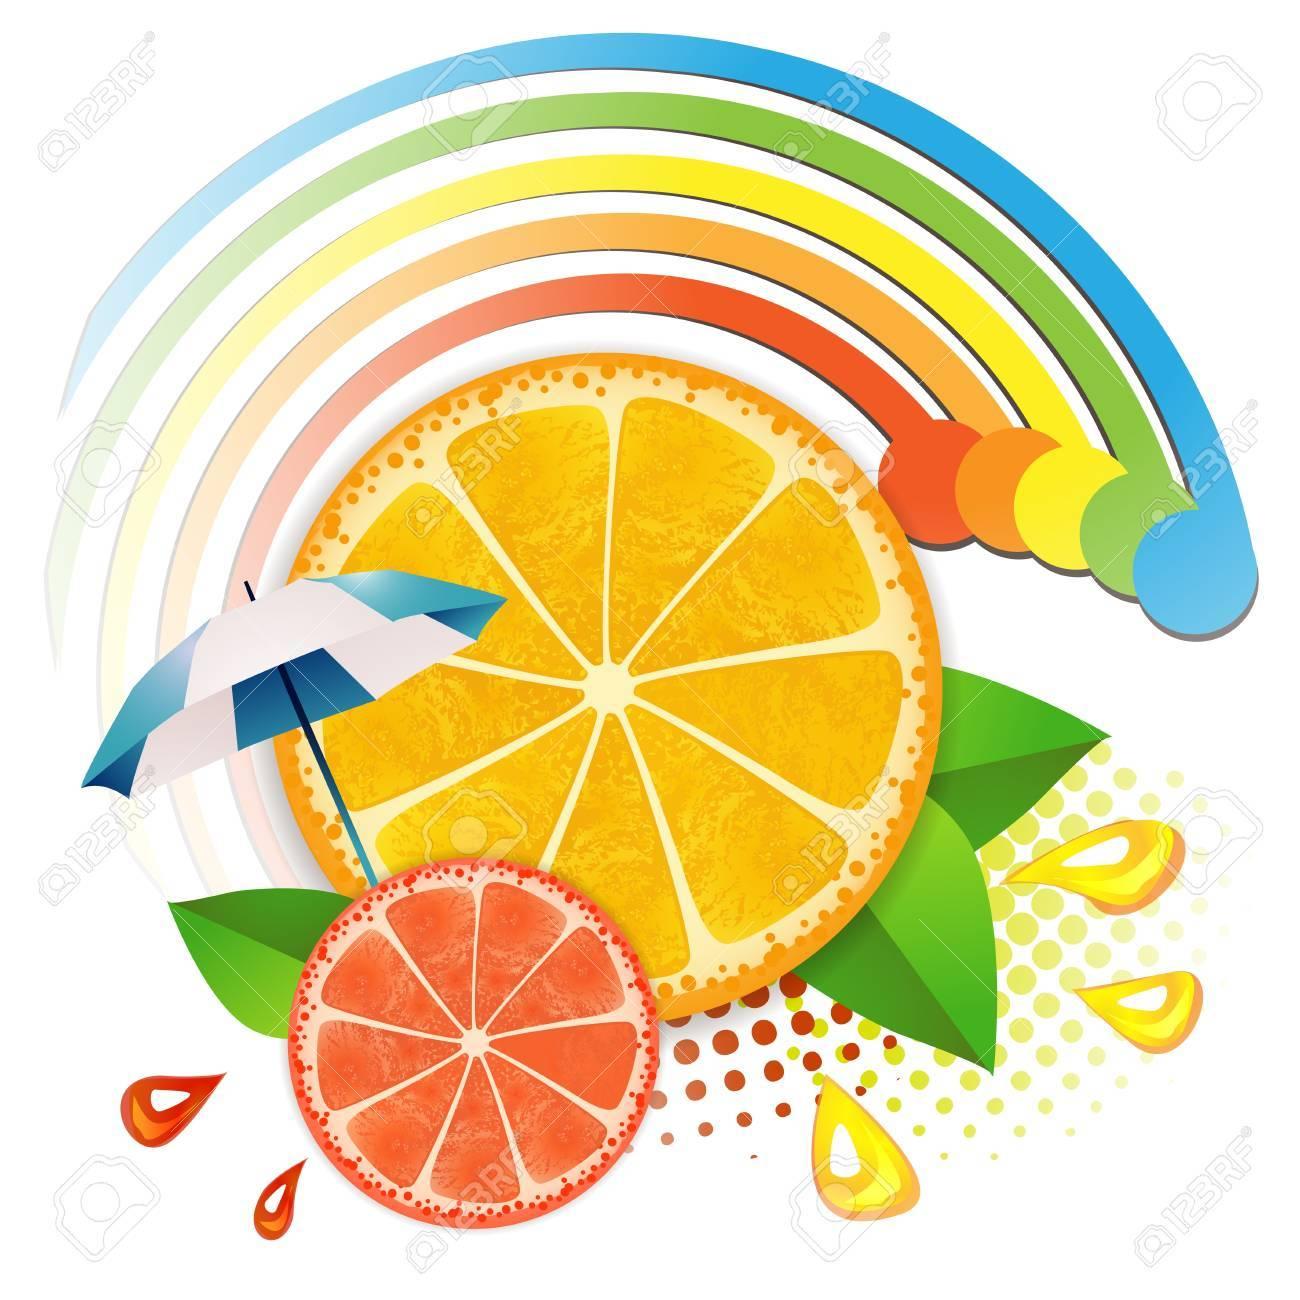 Grapefruit-Juicy Fruit